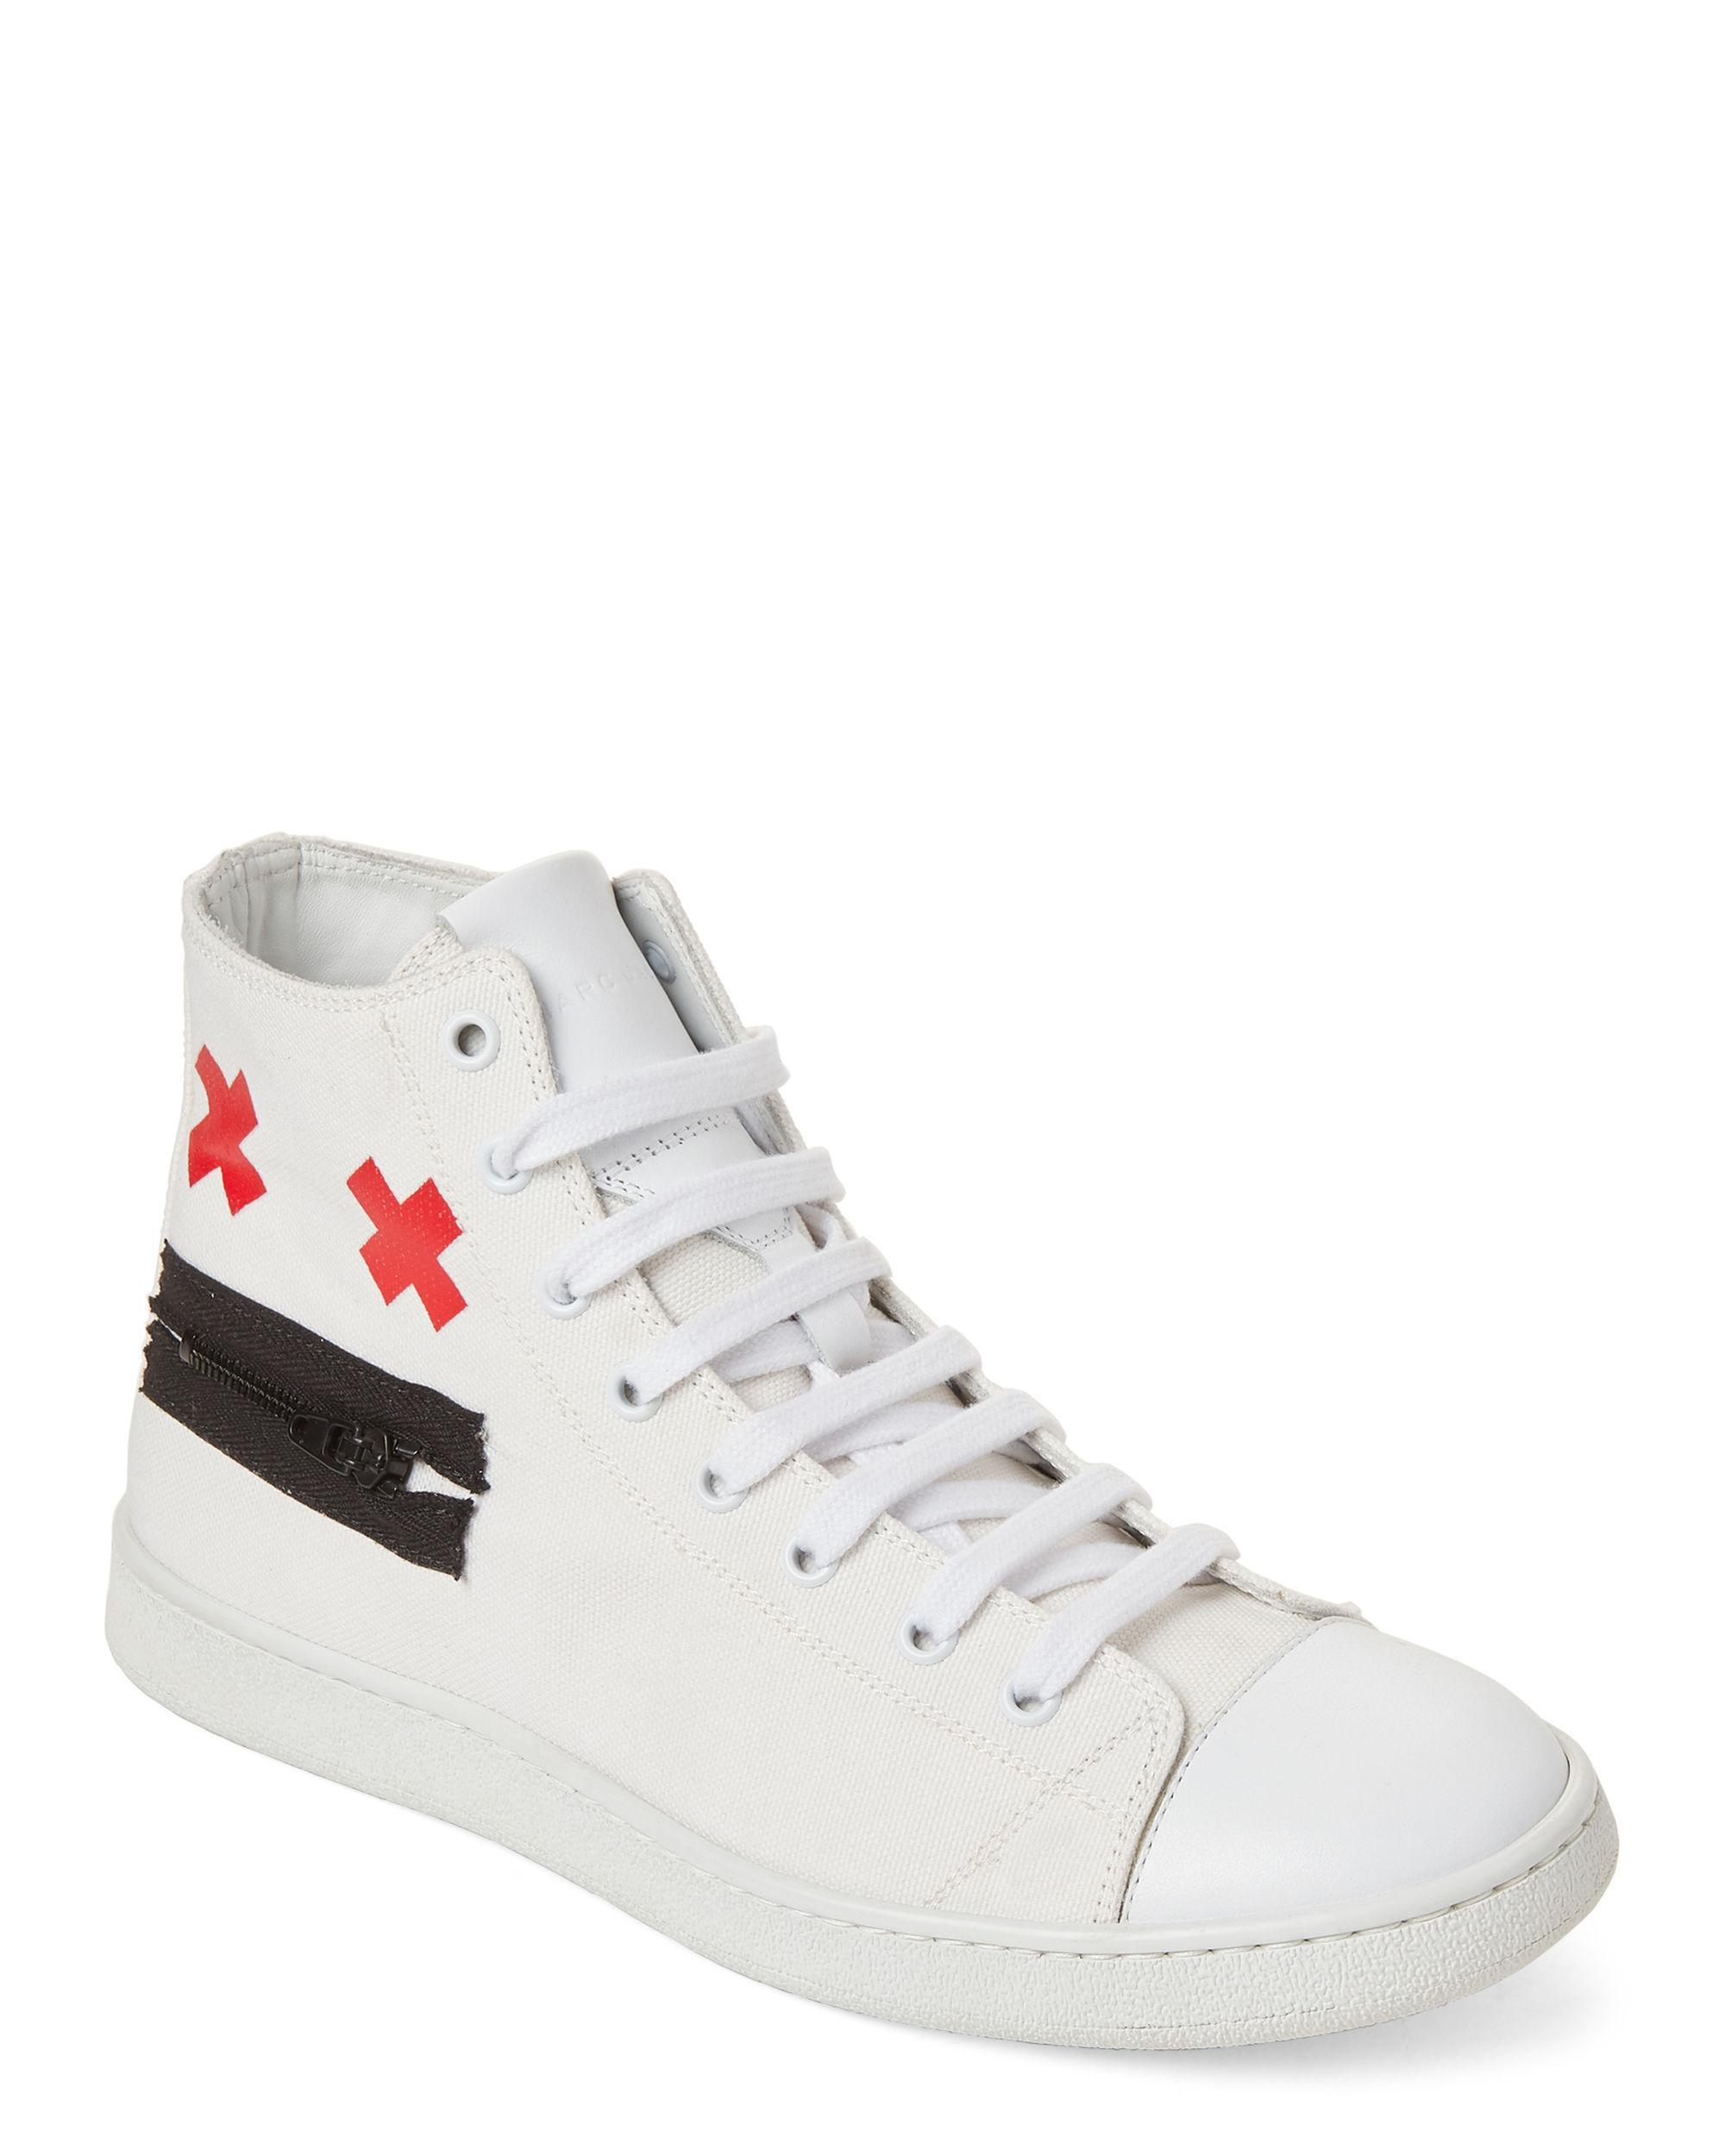 utlopp till salu bästa online kupongskod Marc Jacobs White Zip Face Canvas High-top Sneakers for Men - Lyst